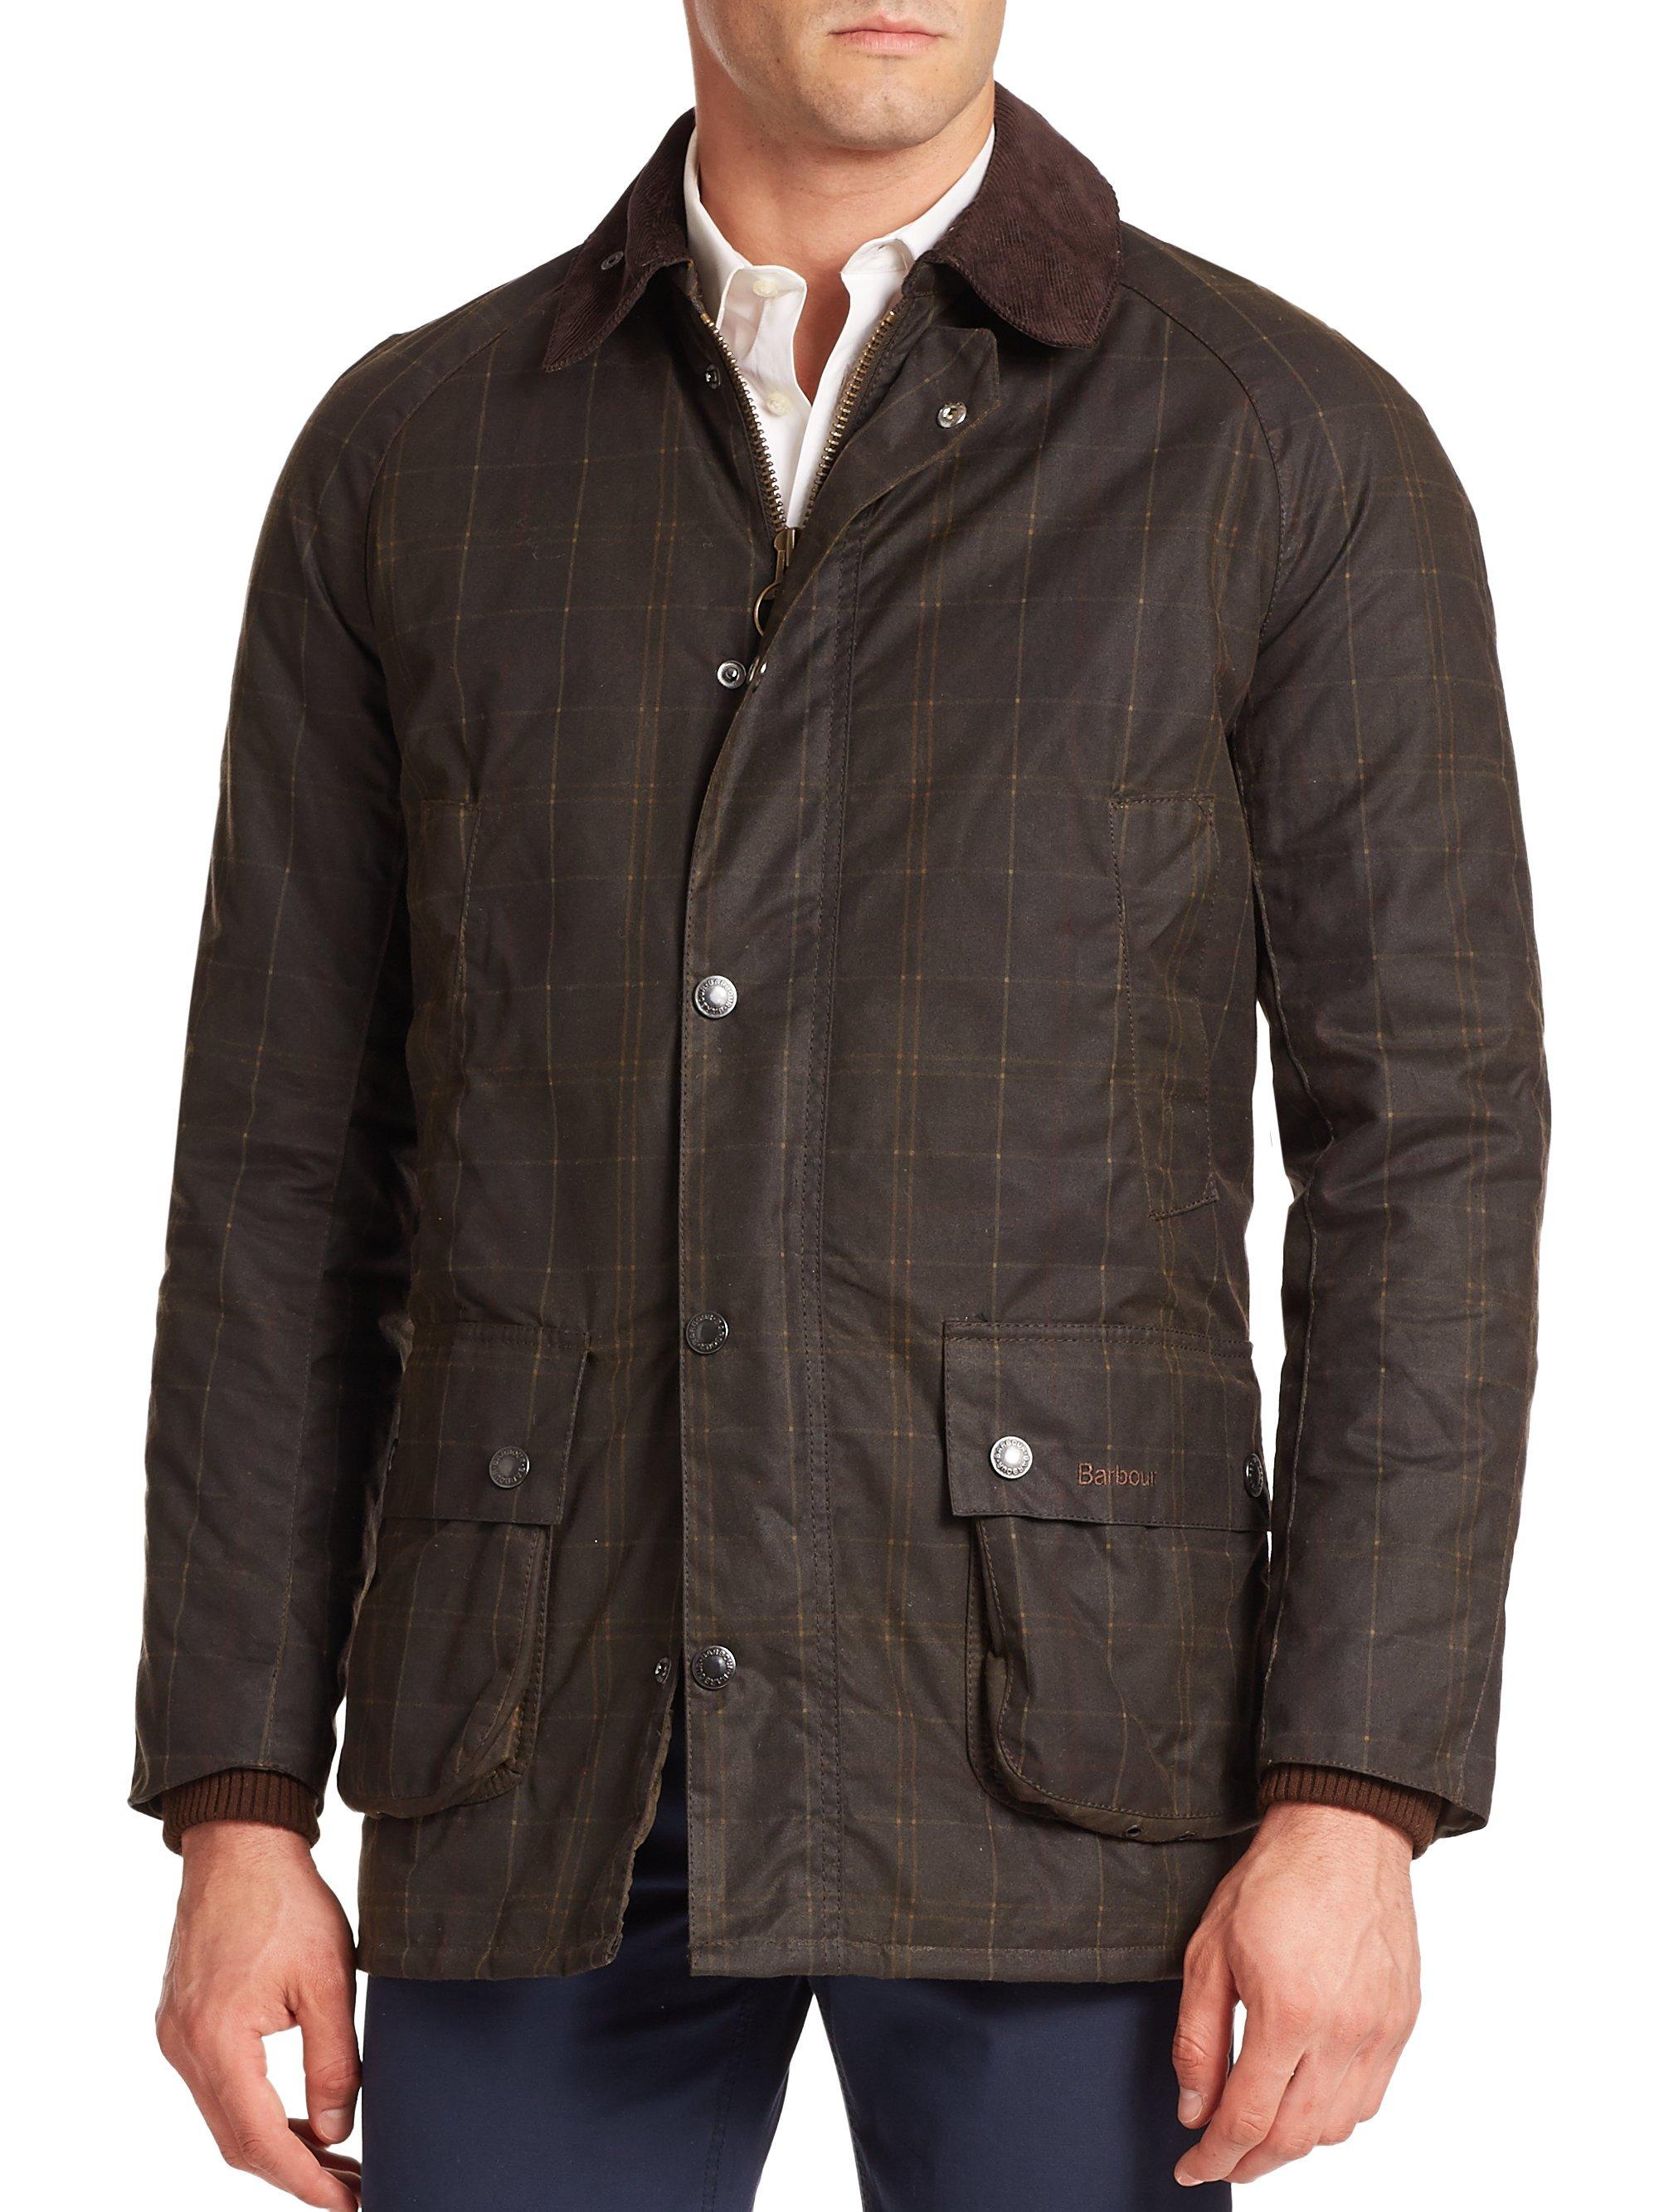 Barbour Hemmingway Printed Waxed Cotton Jacket In Brown